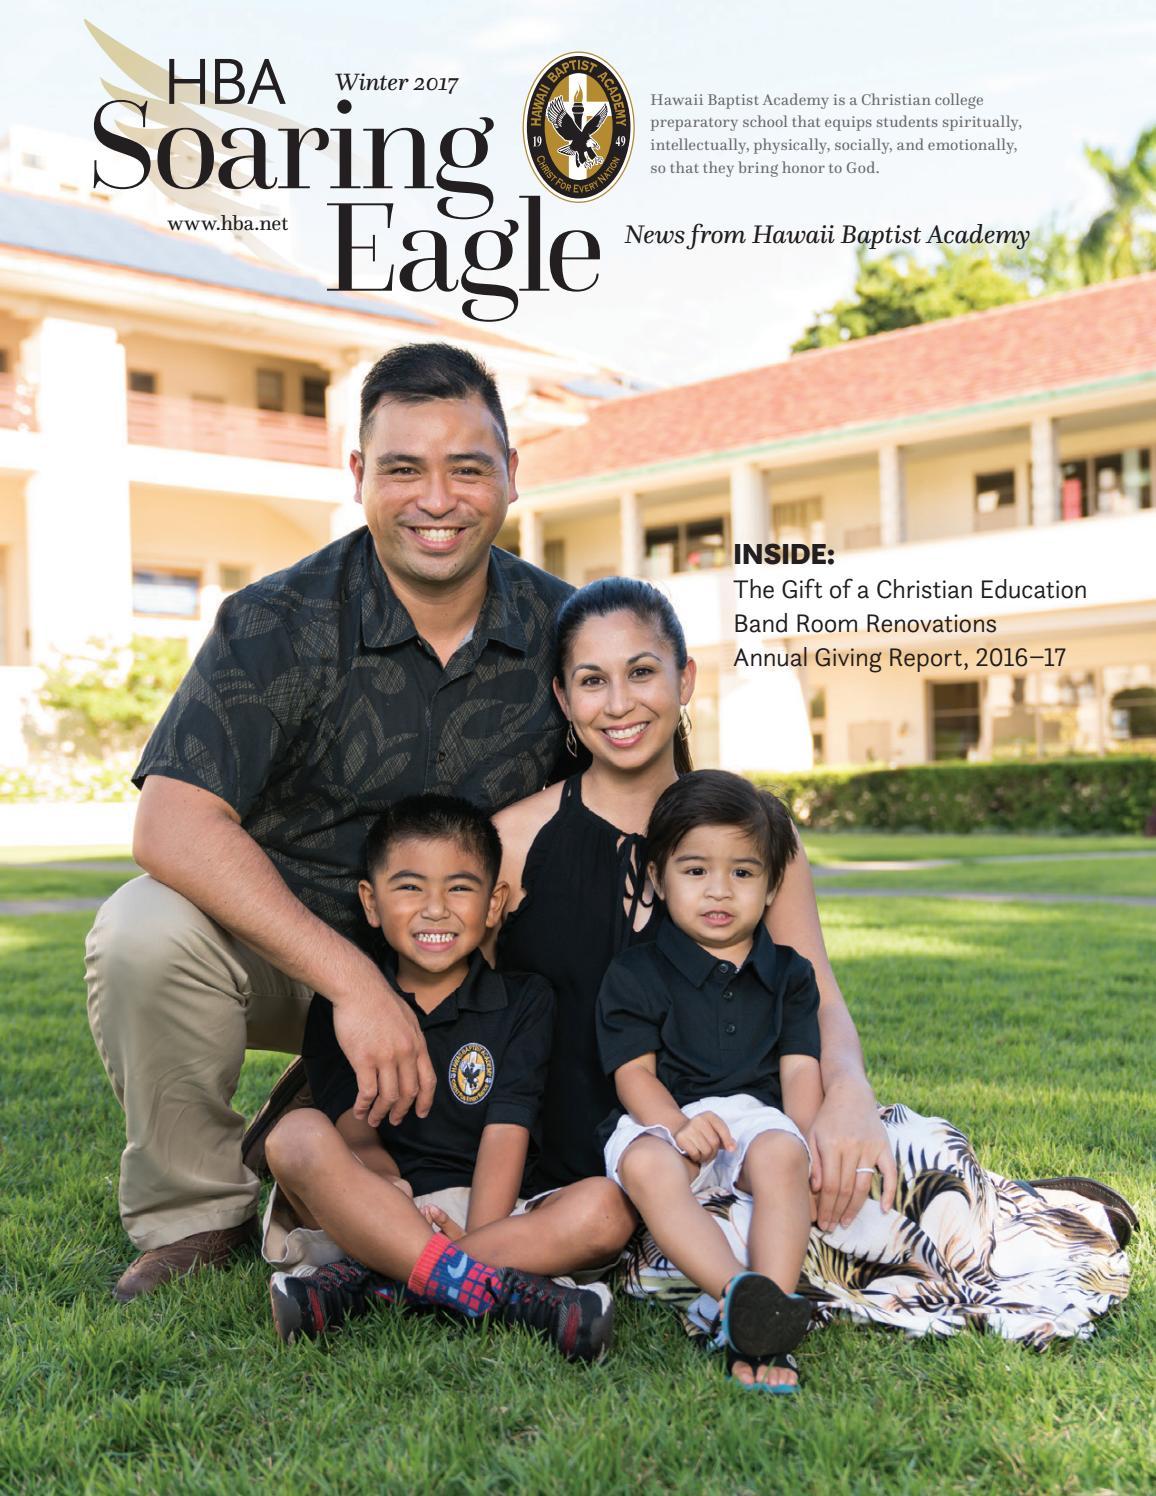 Hawaii Baptist Academy Soaring Eagle Newsletter Winter 2017